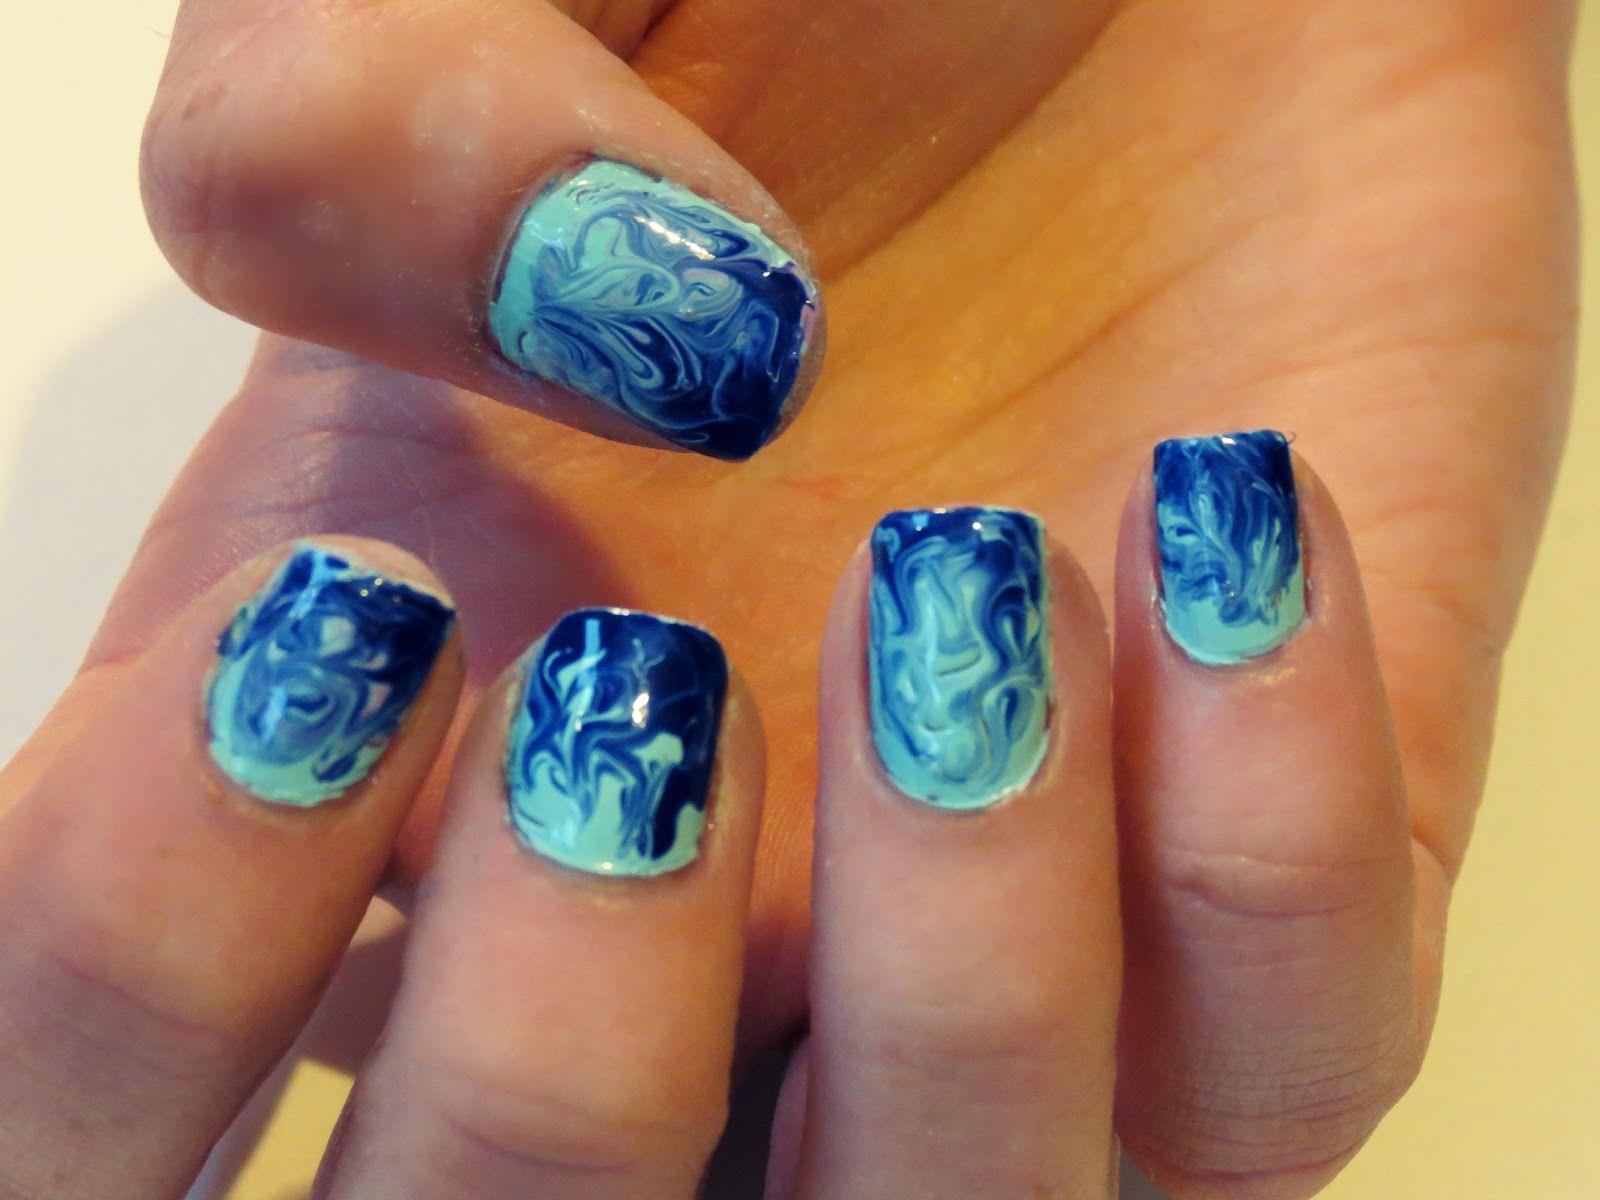 Nailarttutorial Islaay Uk Beauty And Style Blog Swirly Nail